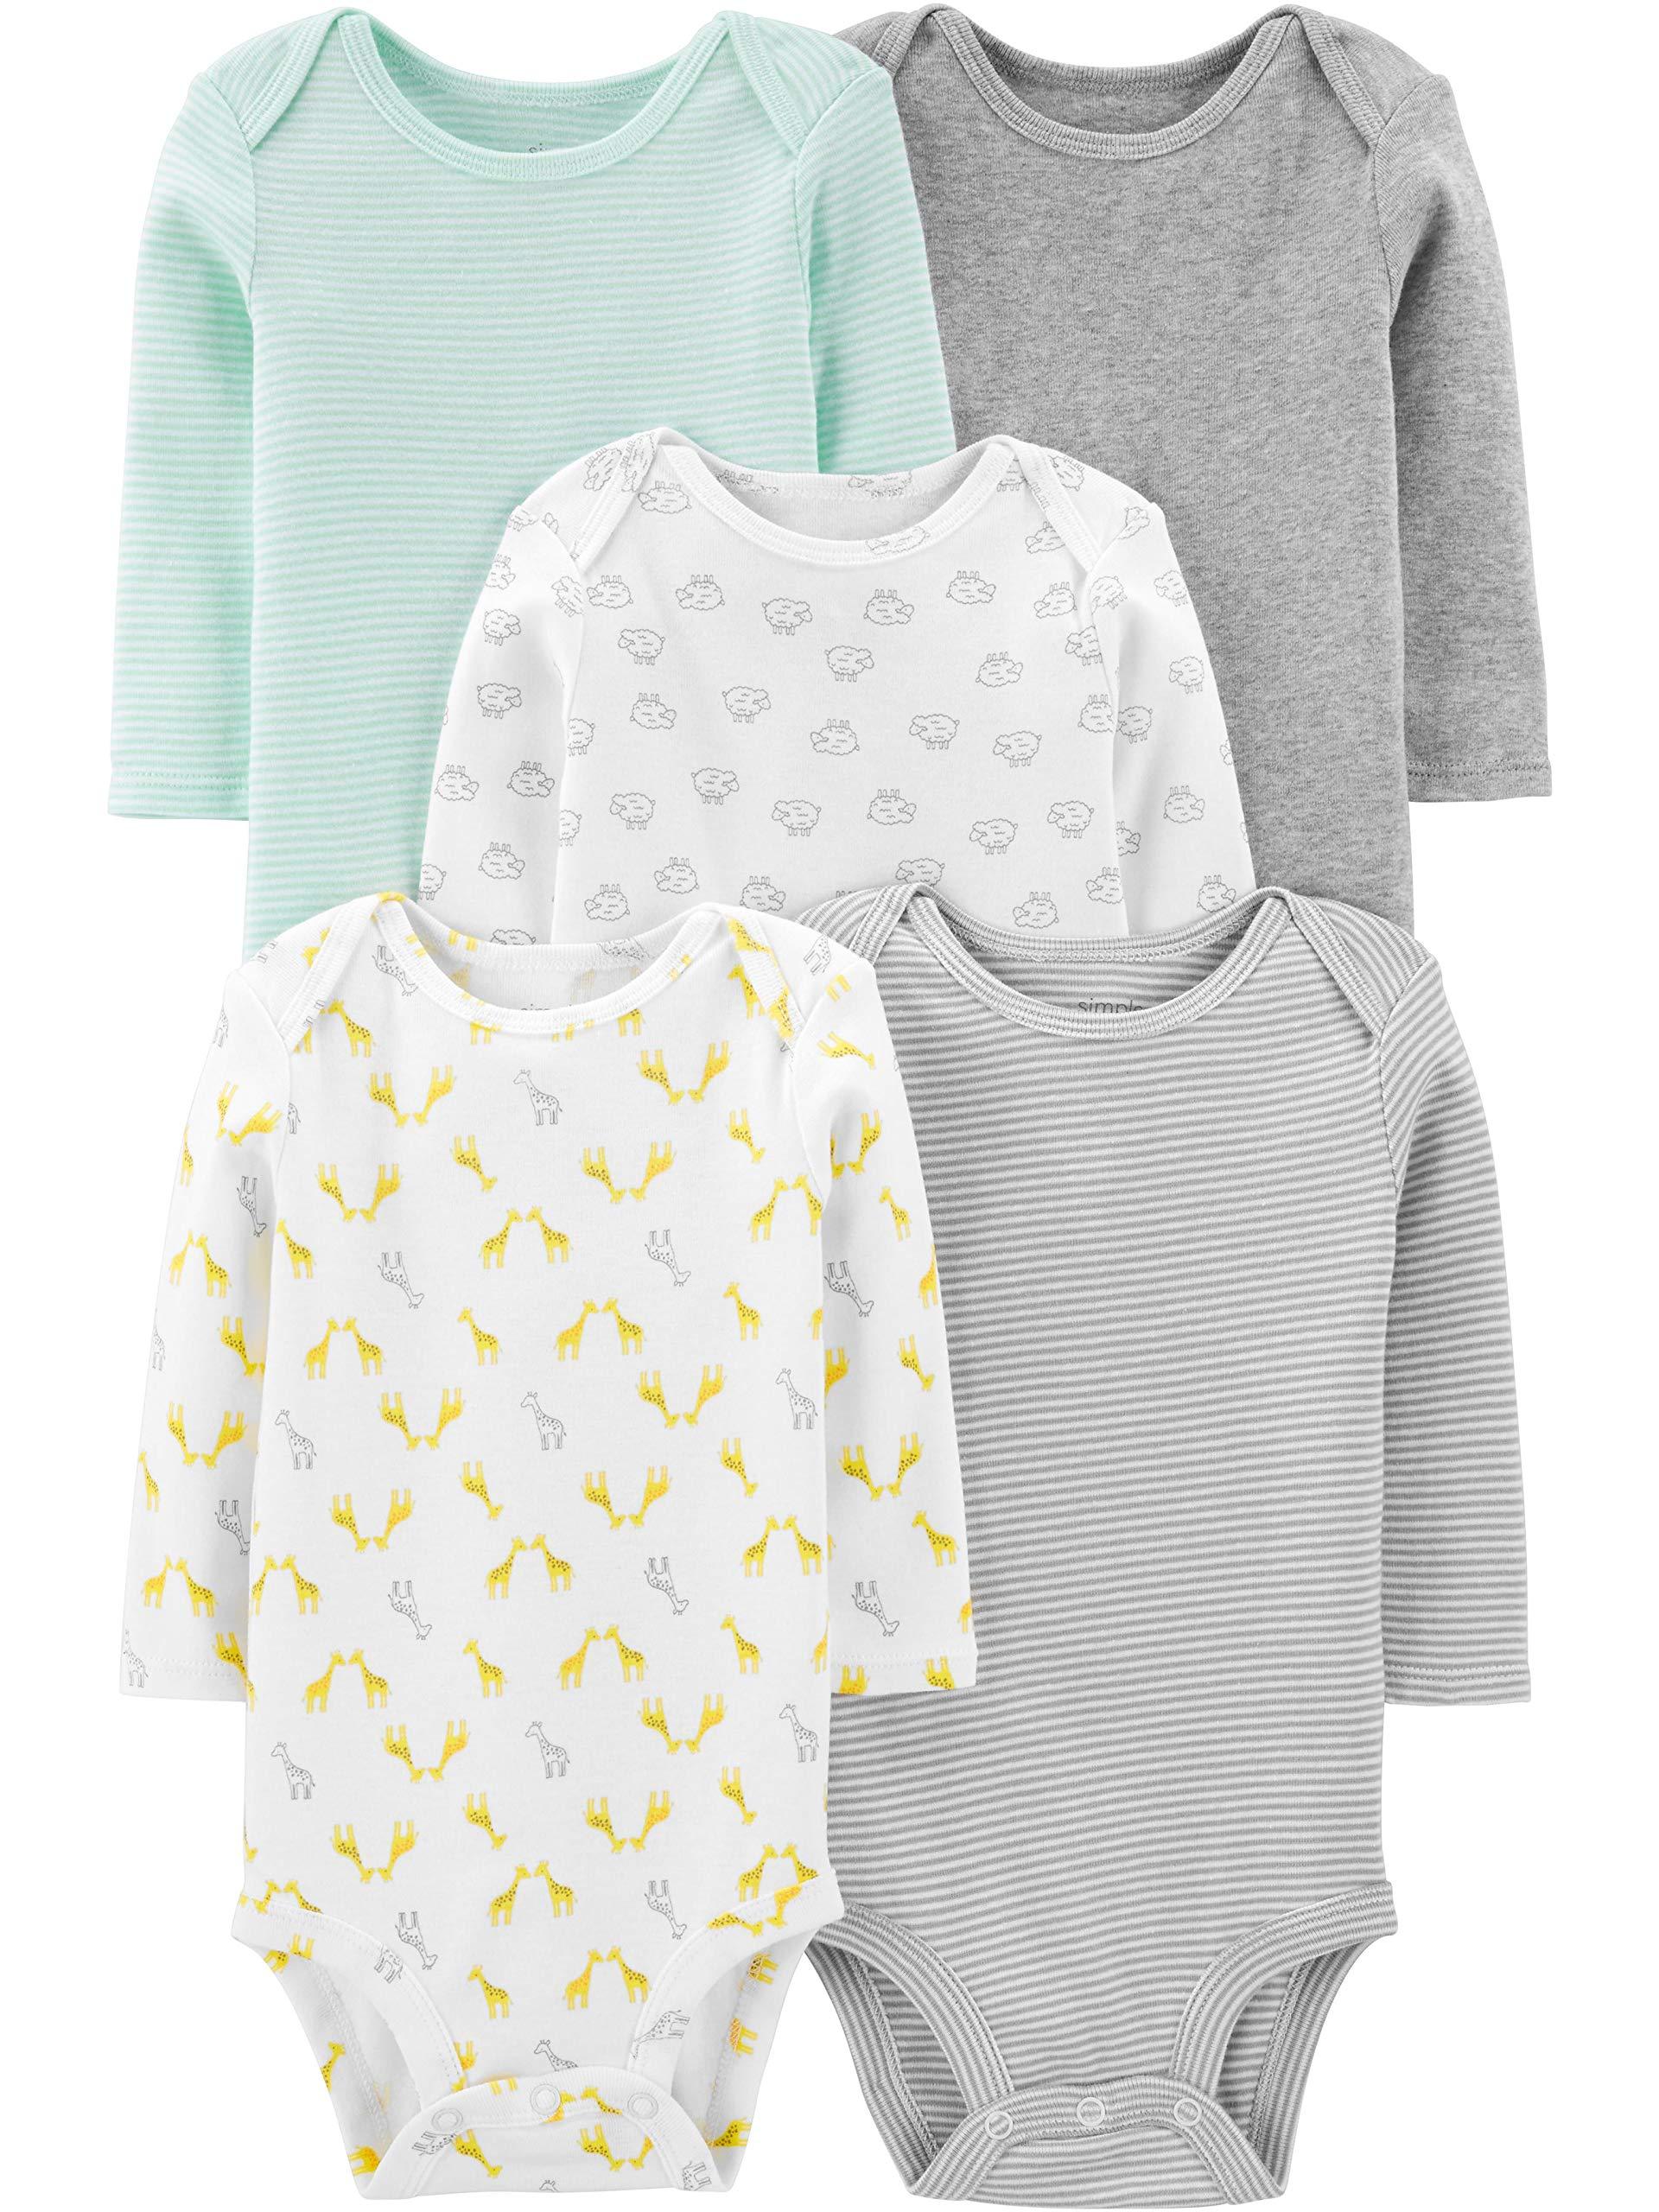 Simple Joys by Carter's Baby Boys' 5-Pack Long-Sleeve Bodysuit